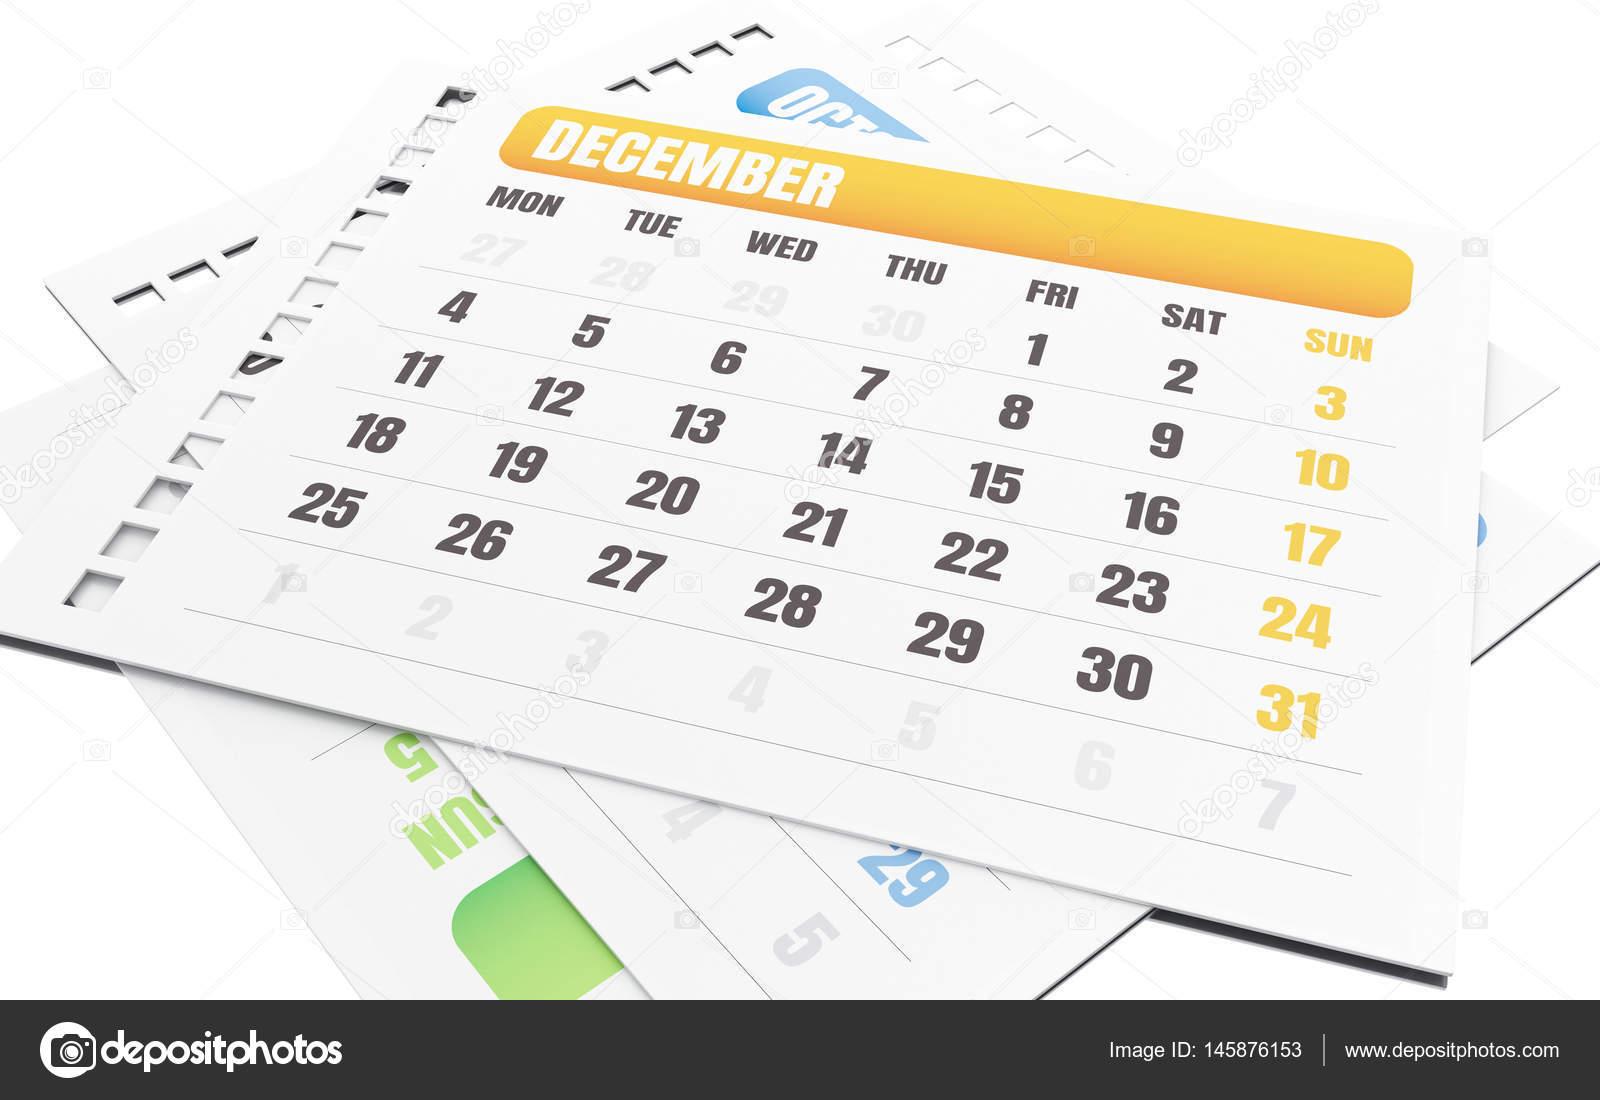 Calendario A Strappo.Calendario A Strappo Mese Dicembre 3d Foto Stock